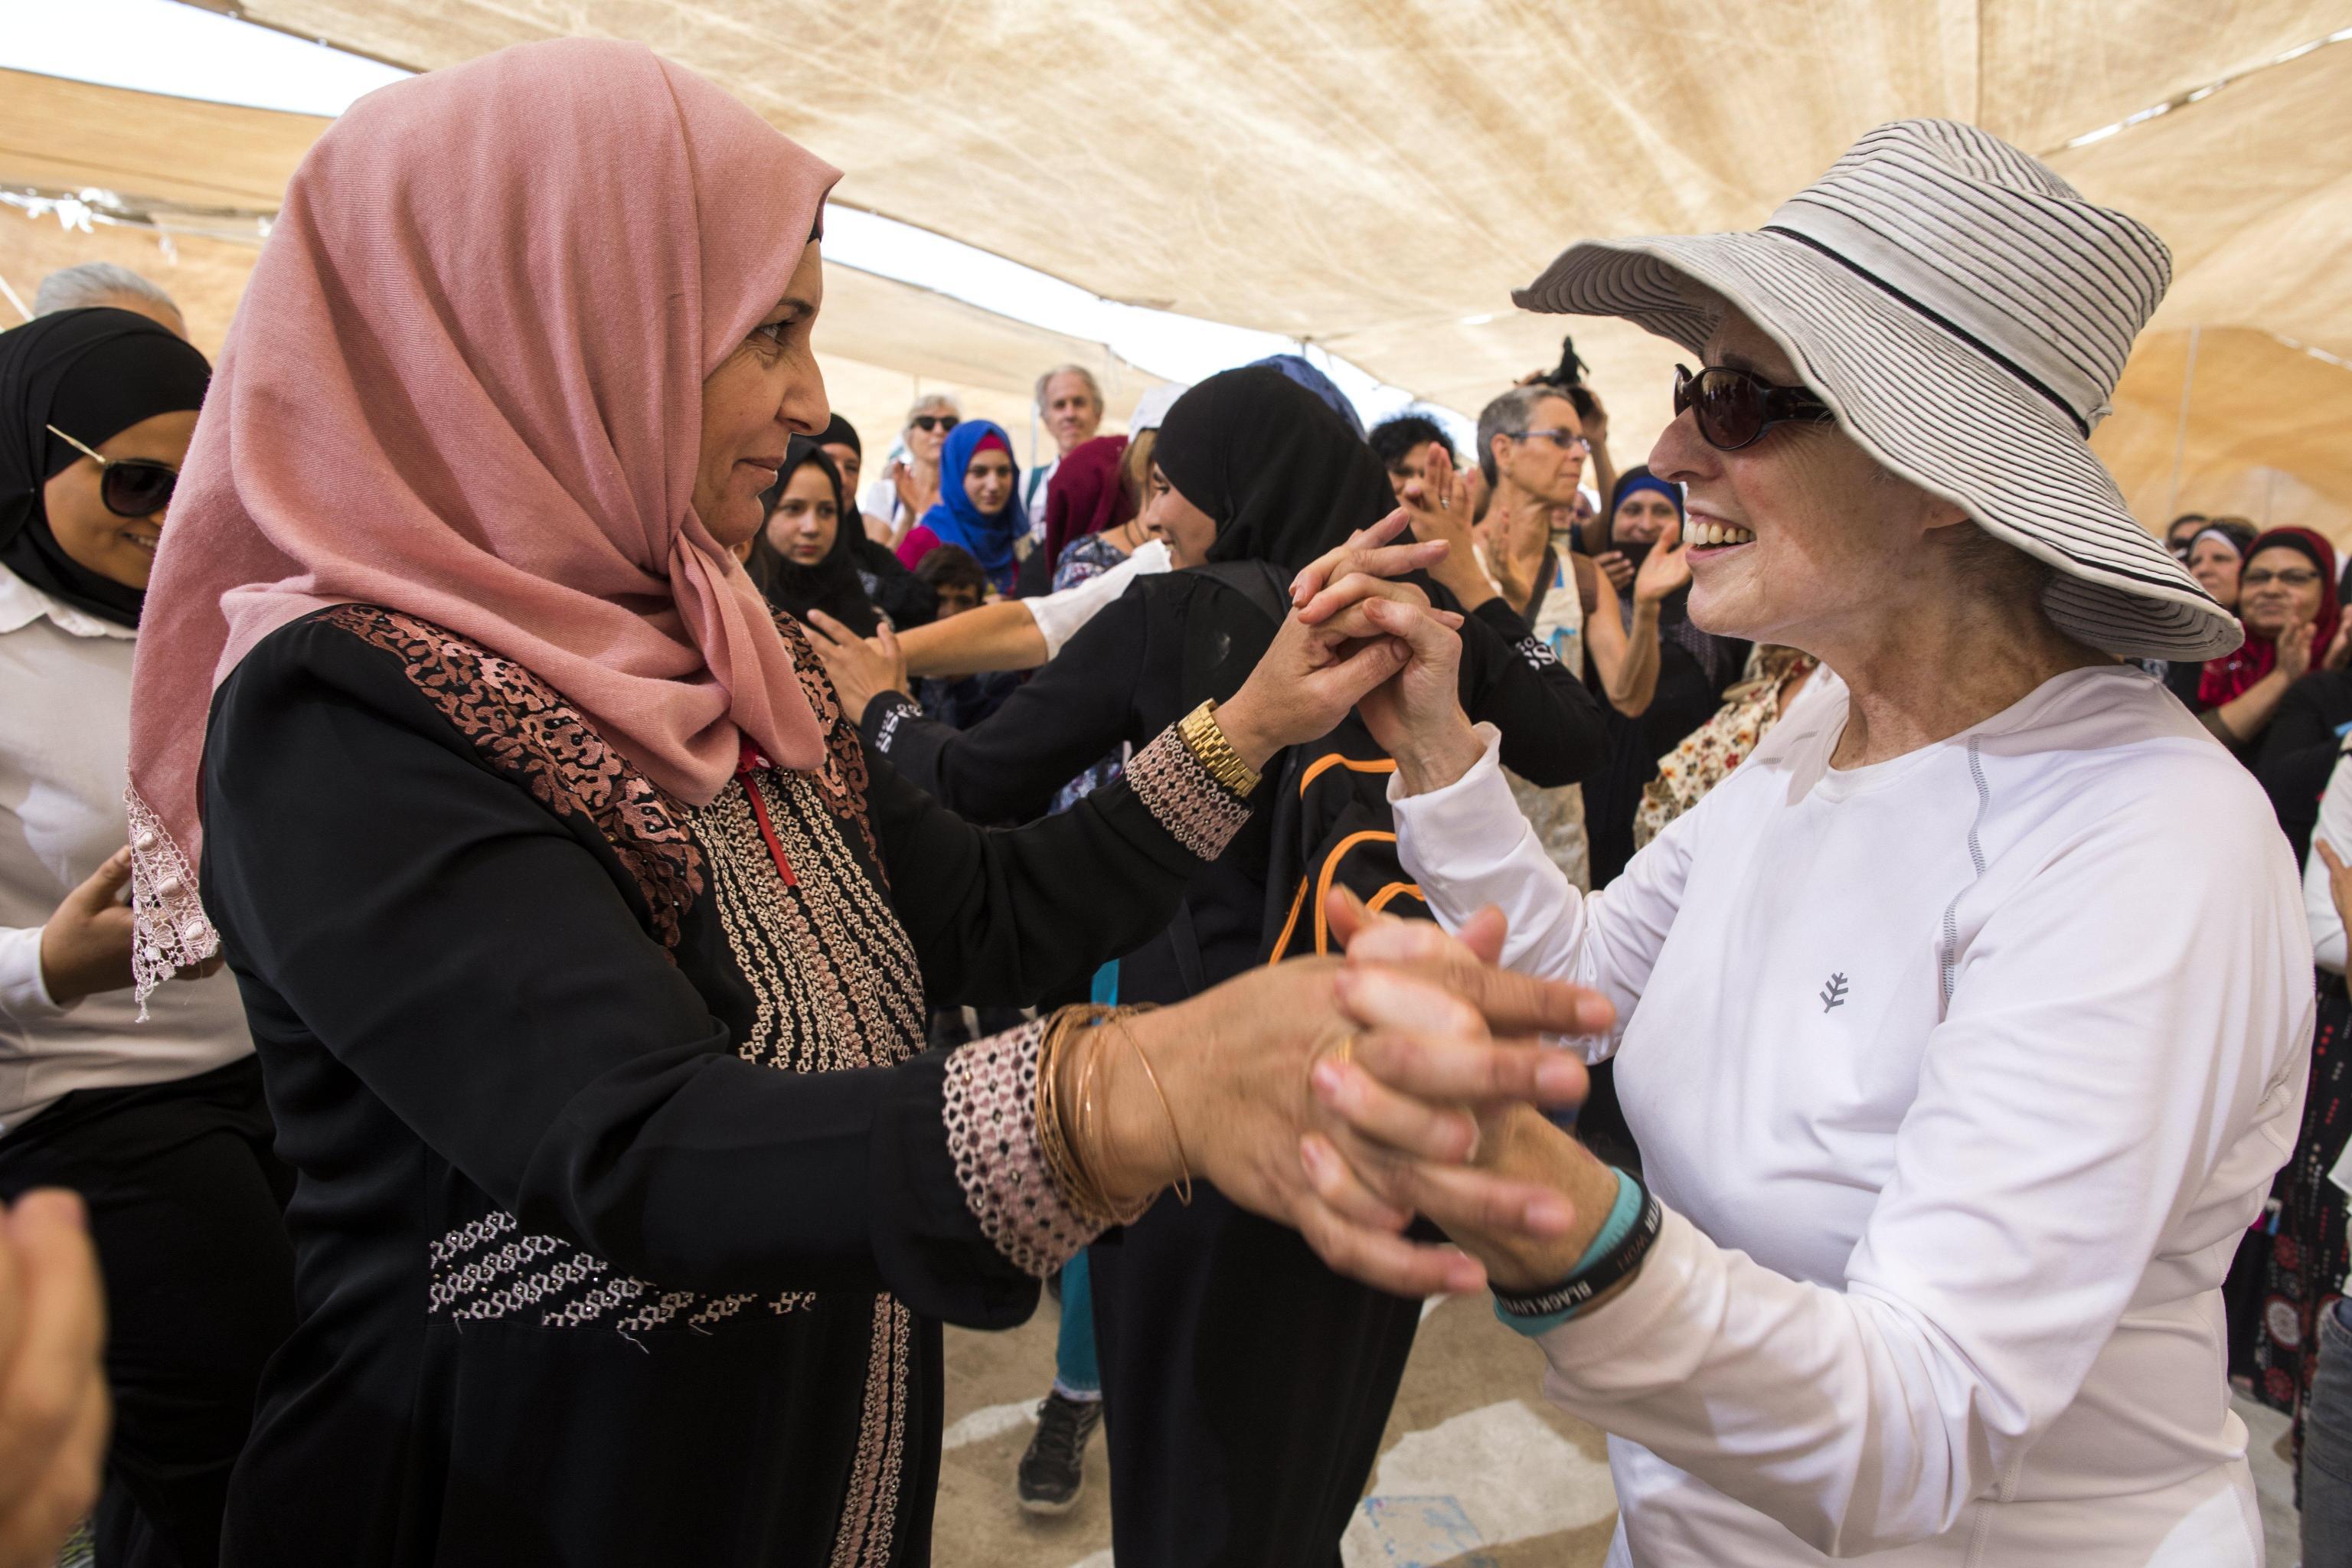 Pace in Medioriente: migliaia di donne in marcia per chiedere accordi